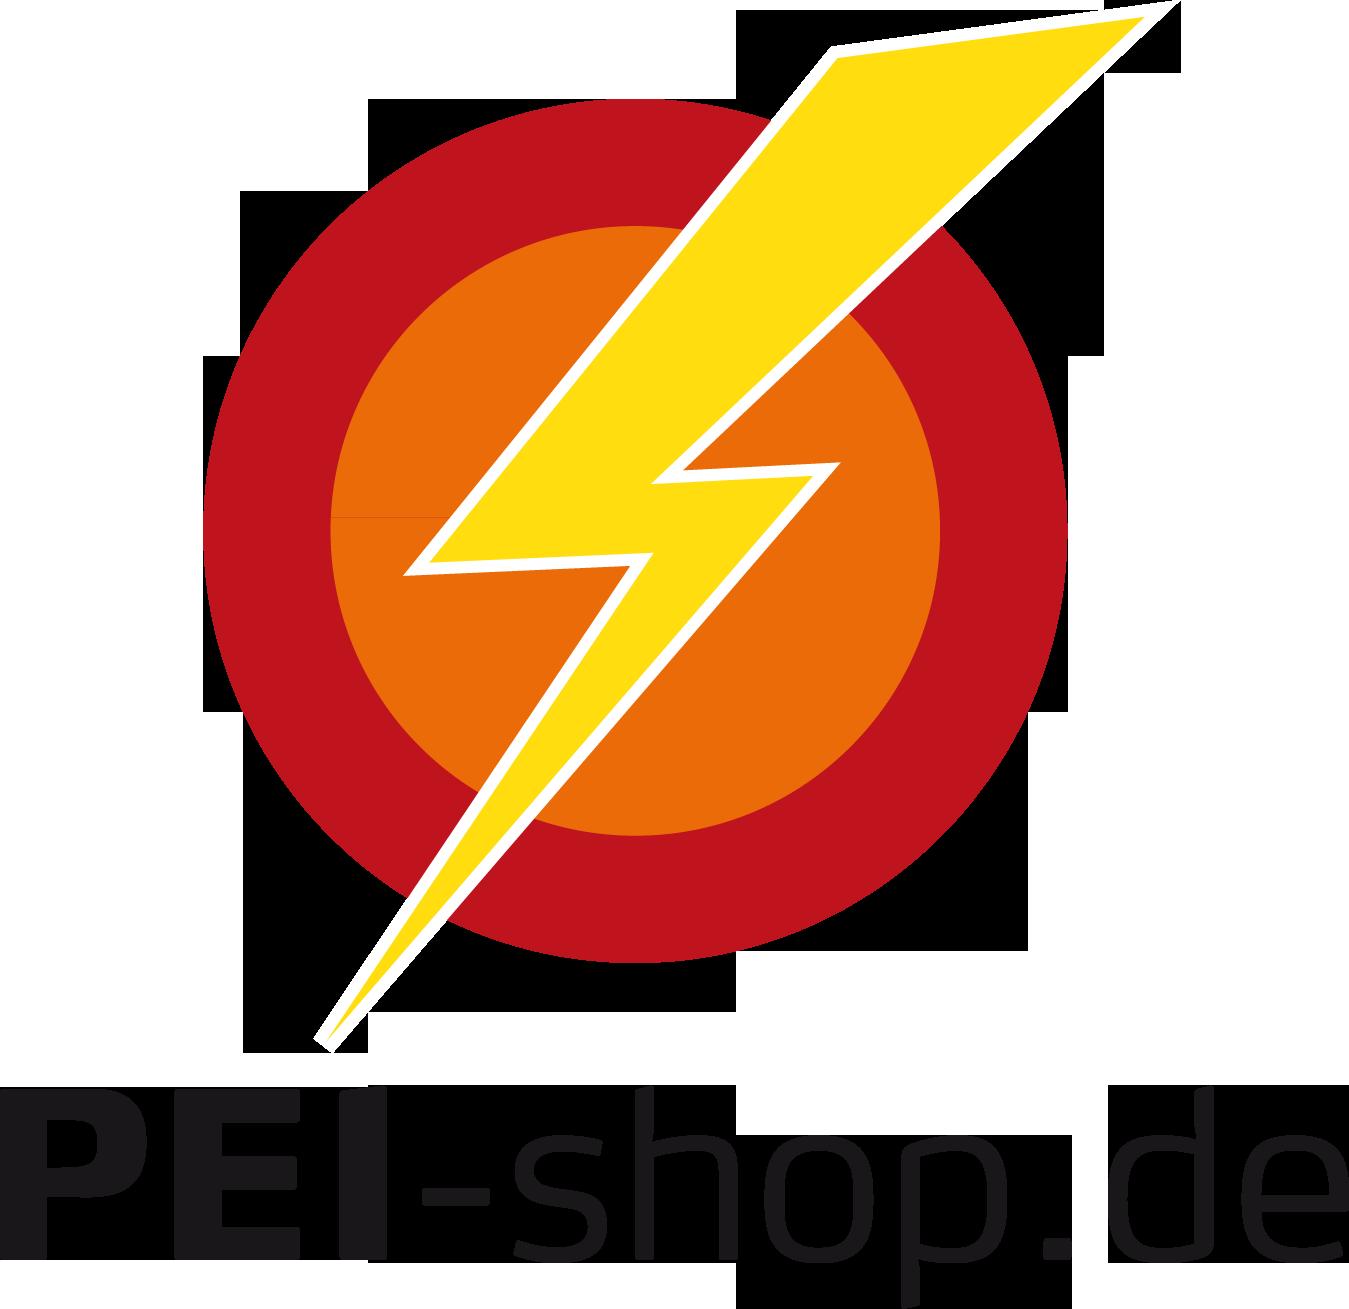 PEI Shop Logo